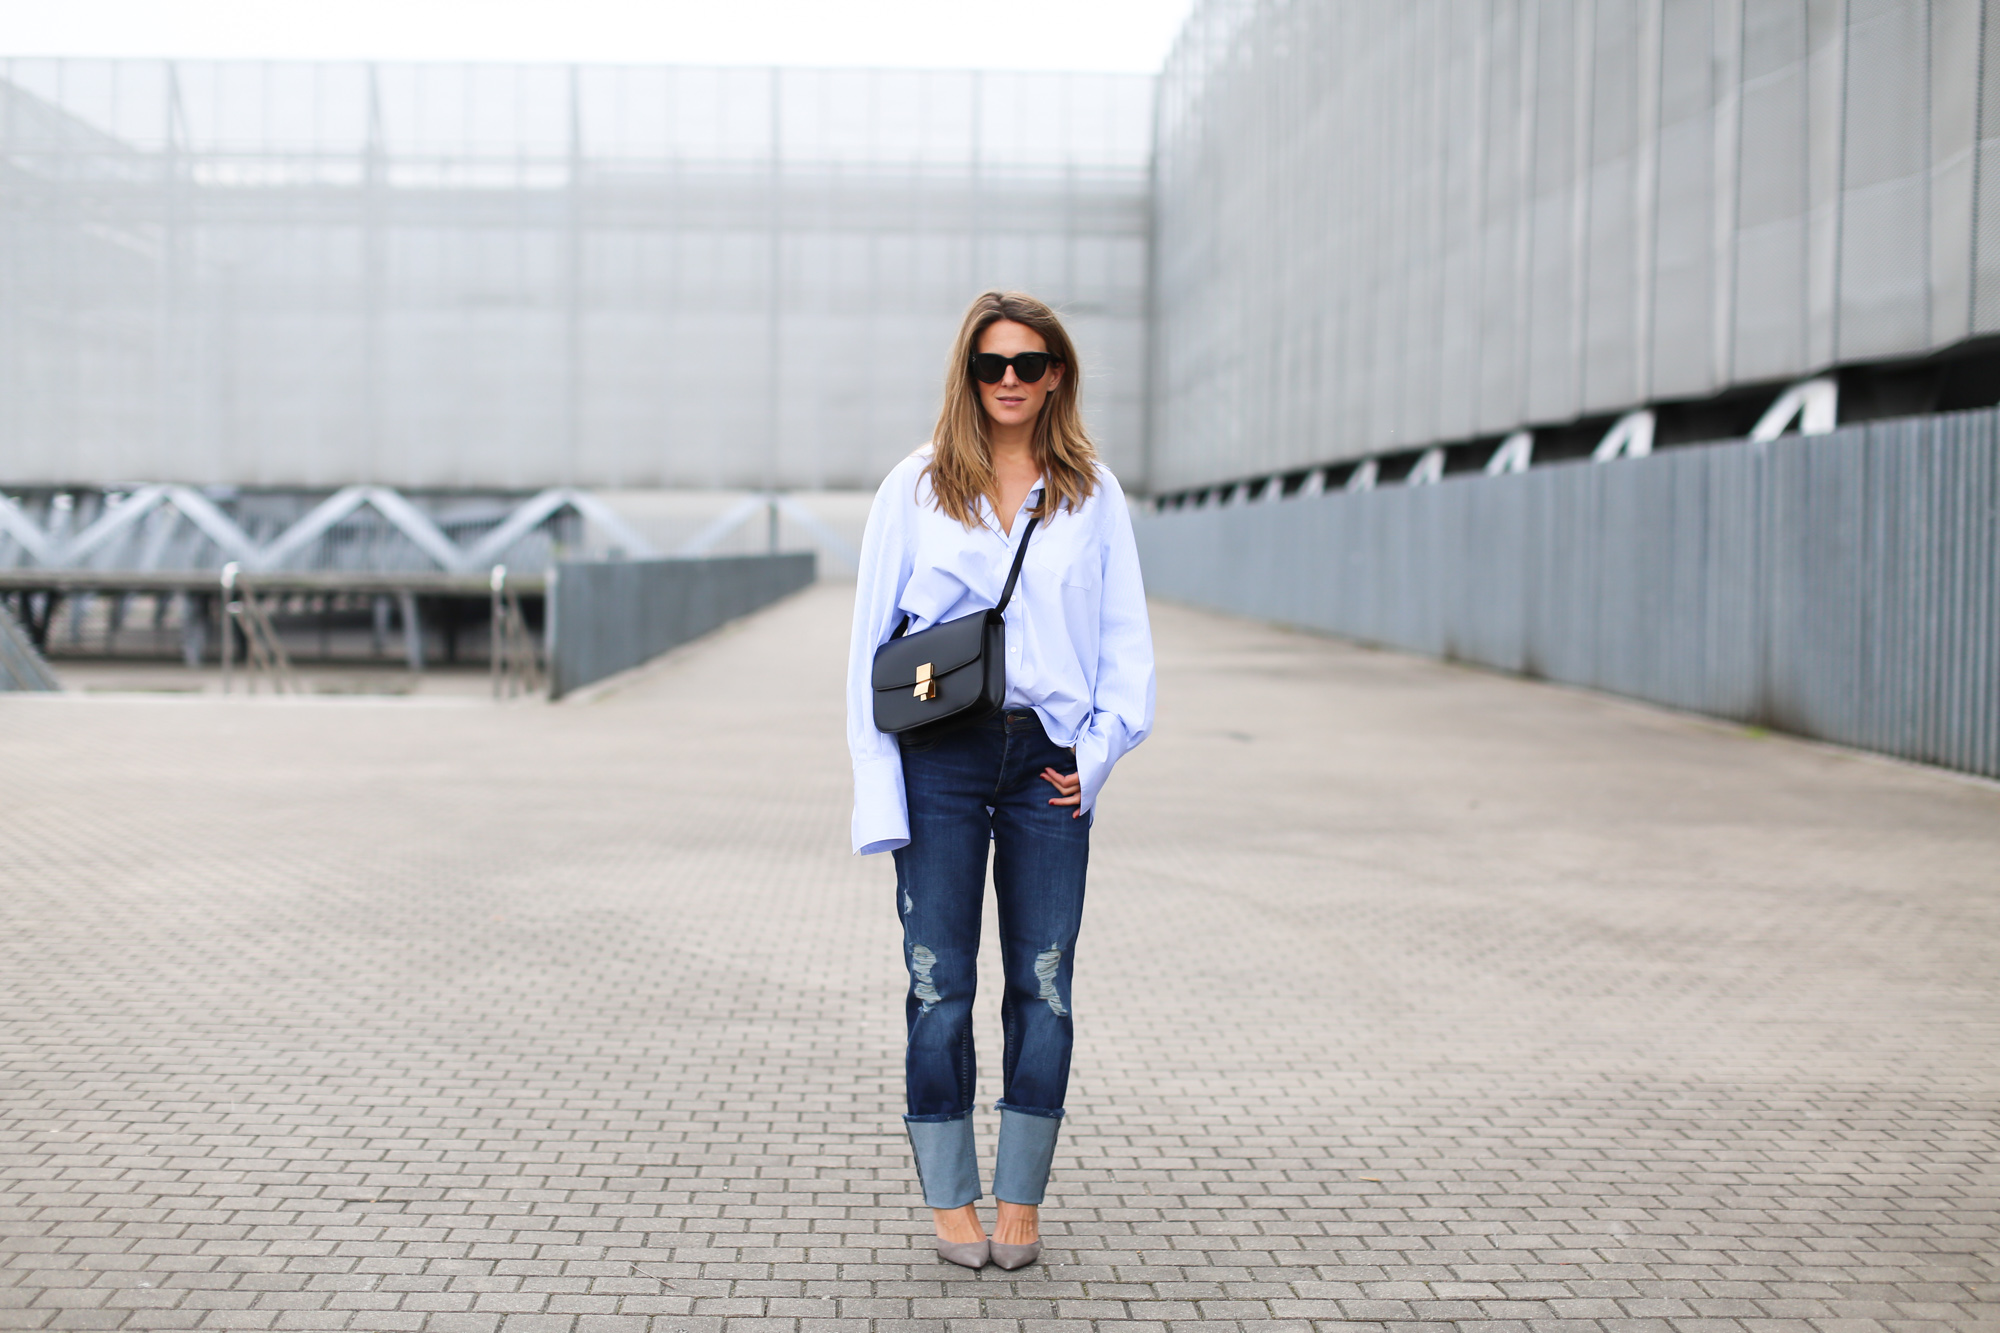 Clochet_fashionblogger_streetstyle_distressedboyfriendjeans_celineparisboxbag-2